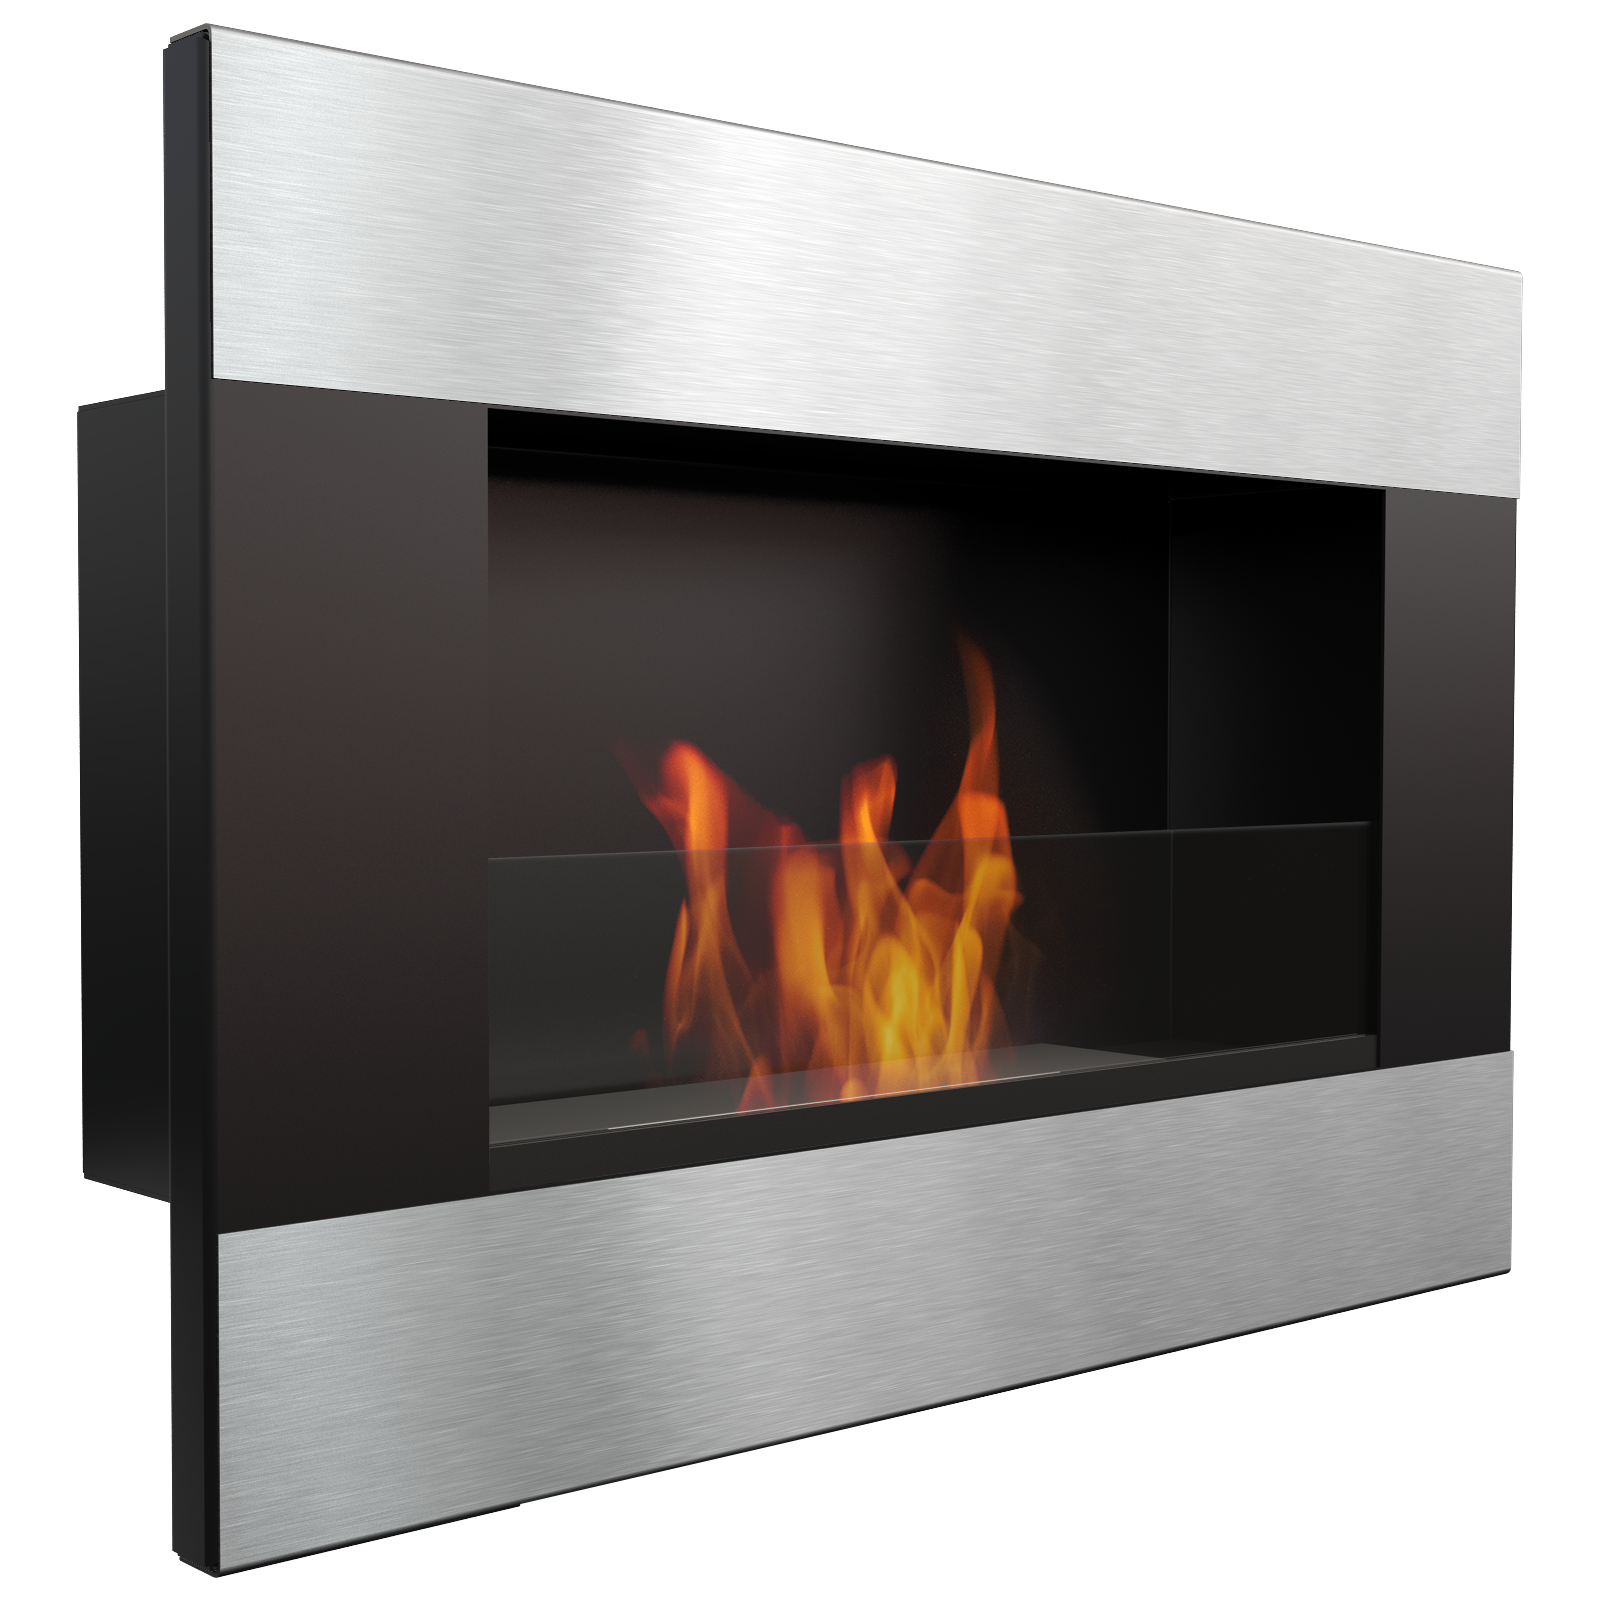 bio fireplace delta horizontal ireland biofire biofireplace kratki